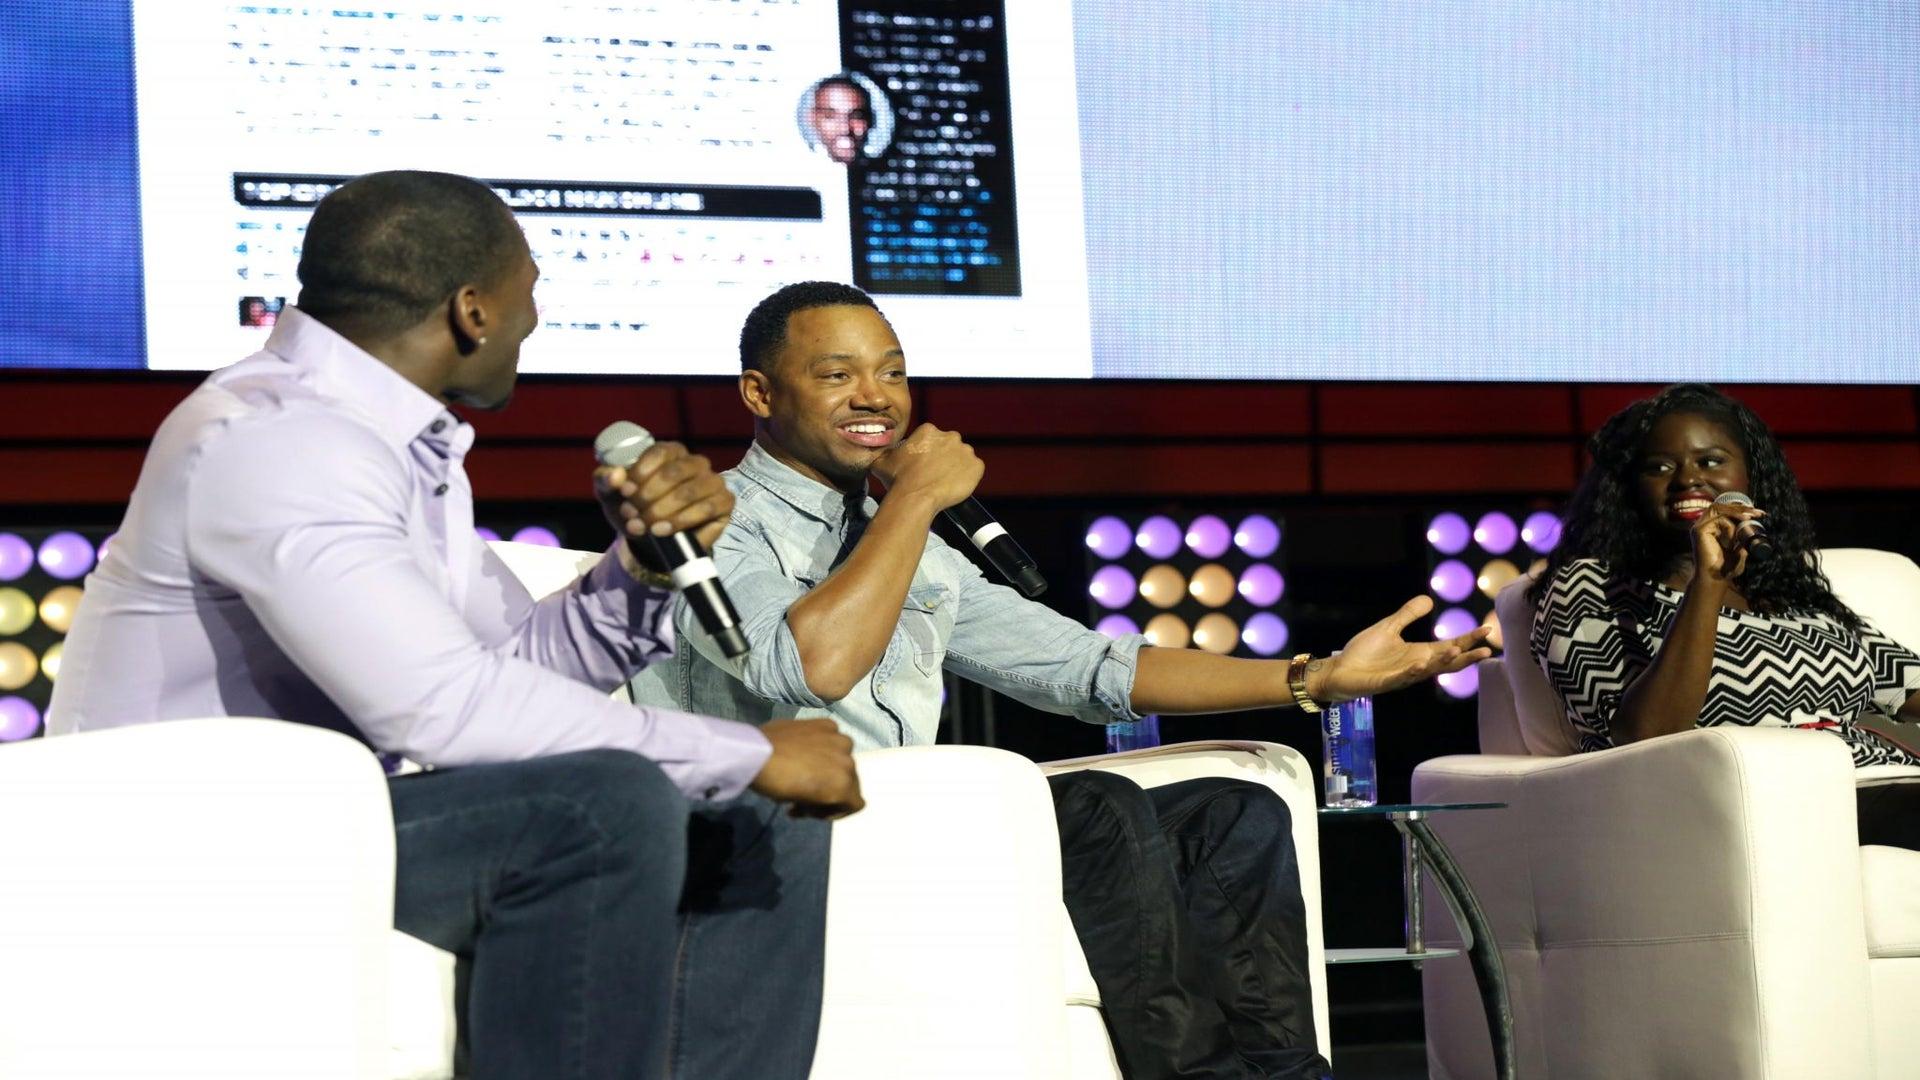 ESSENCE Empowerment: Black Men Talk Romance and Natural Beauty